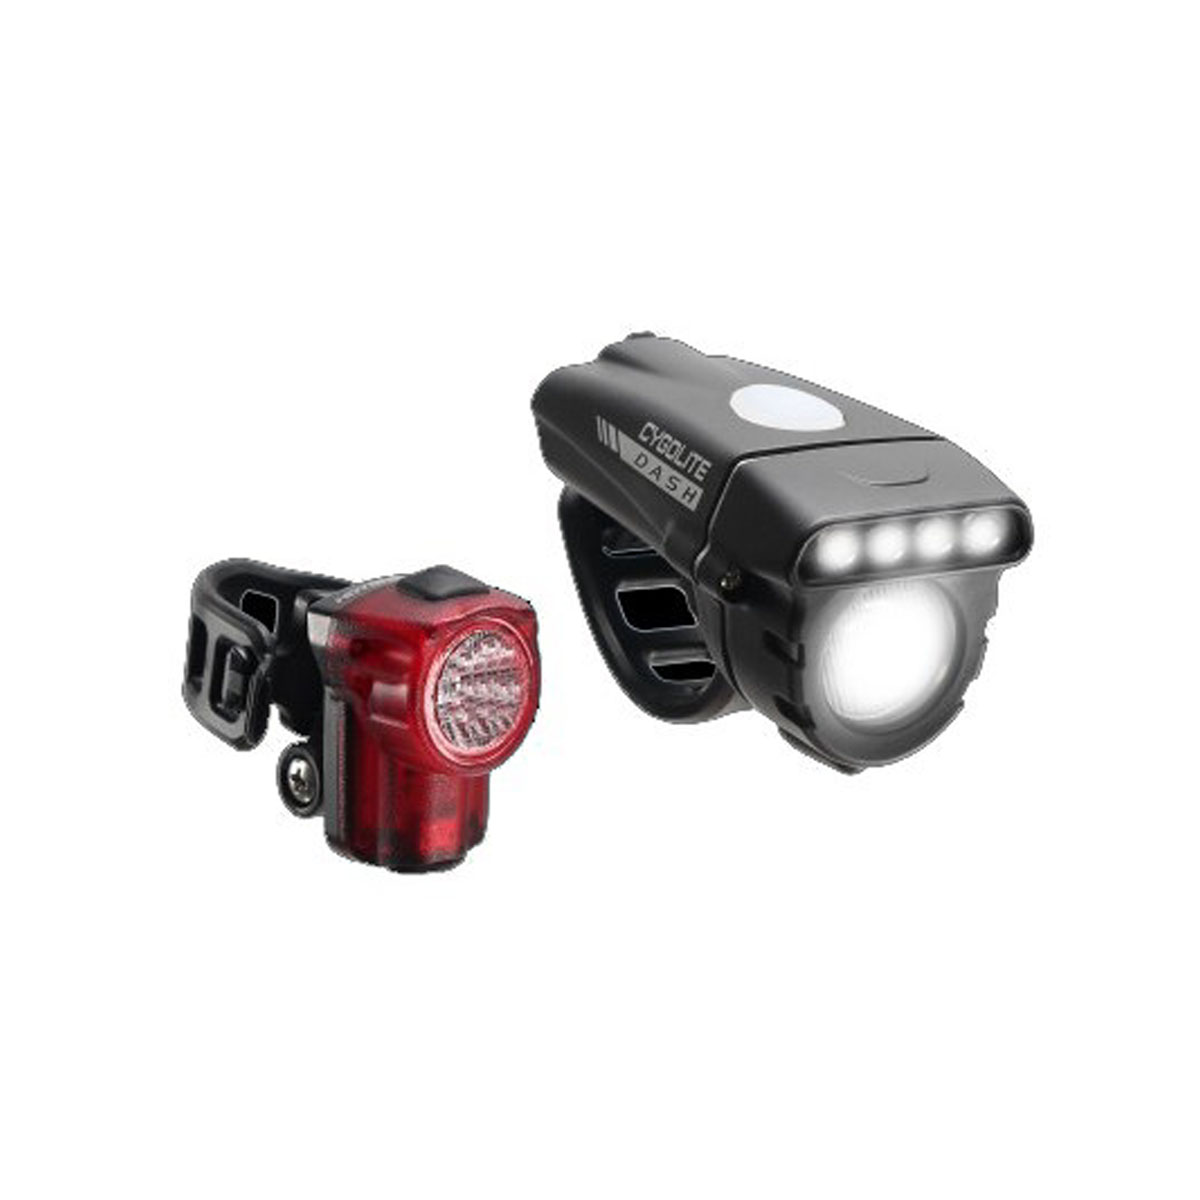 Cygolite Dash 460/ Hotshot Micro 30 Bicycle Light Set - D...